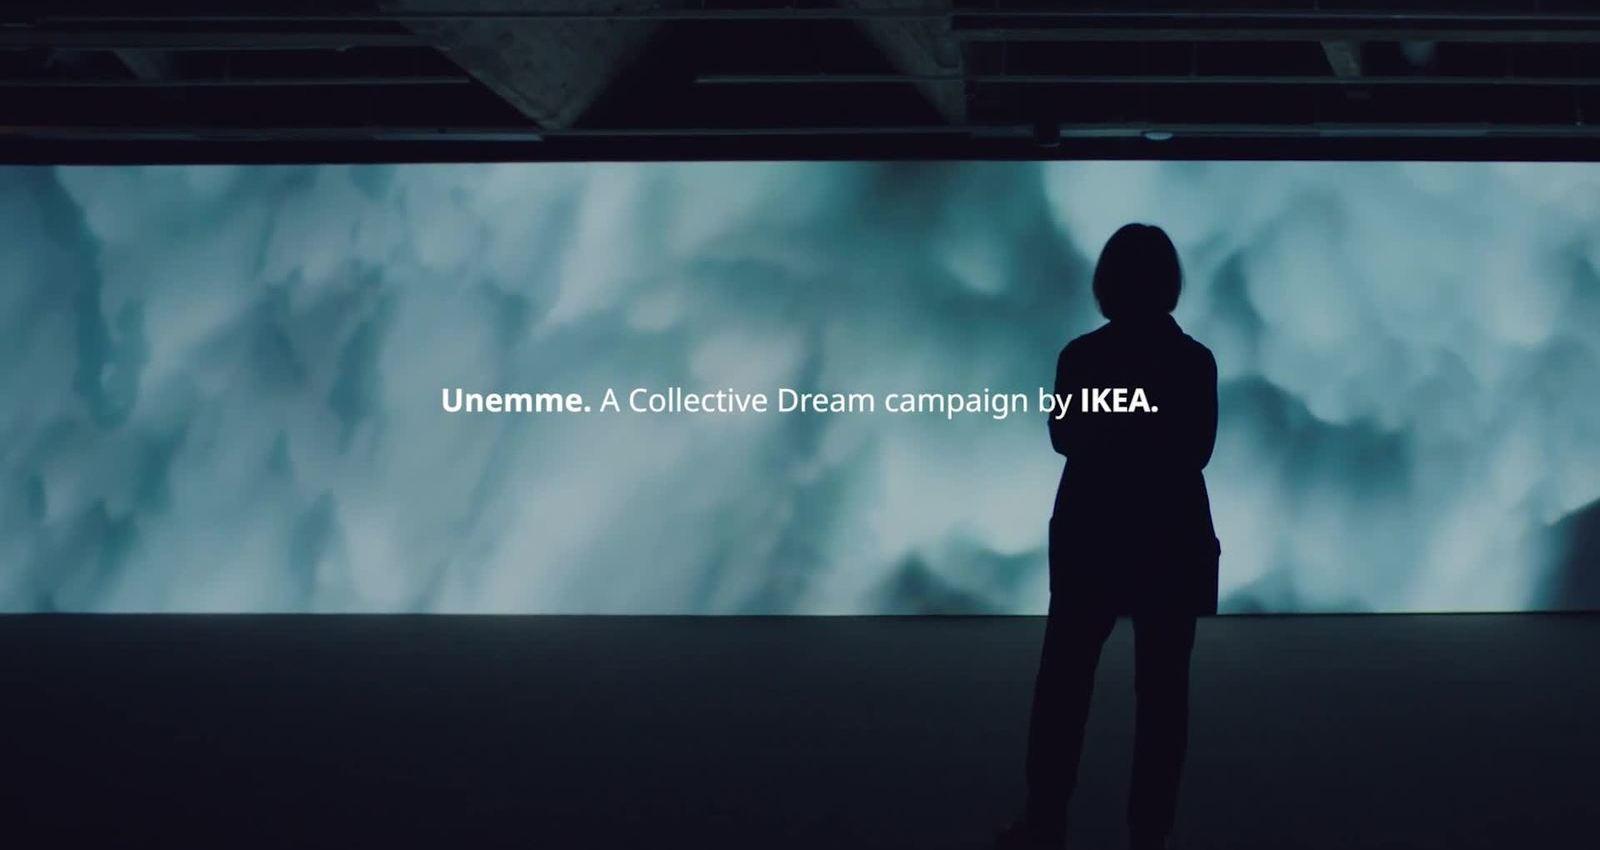 IKEA creates art from Finnish dreams.